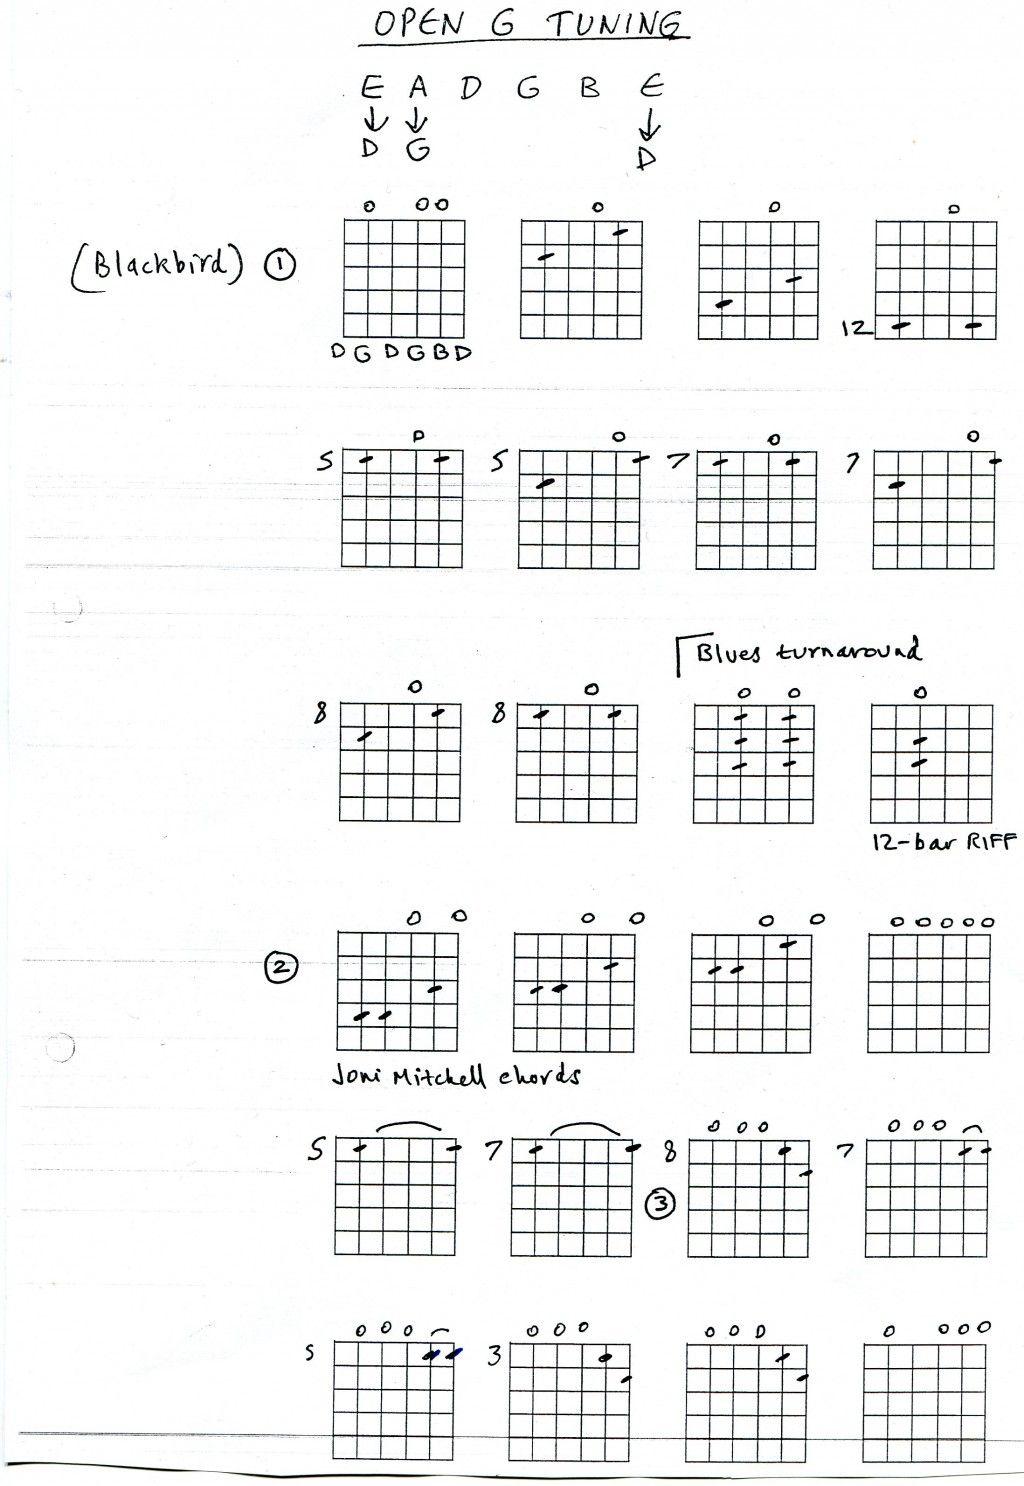 Guitar Open G Tuning Songs Guitars Guitar Chords And Slide Guitar